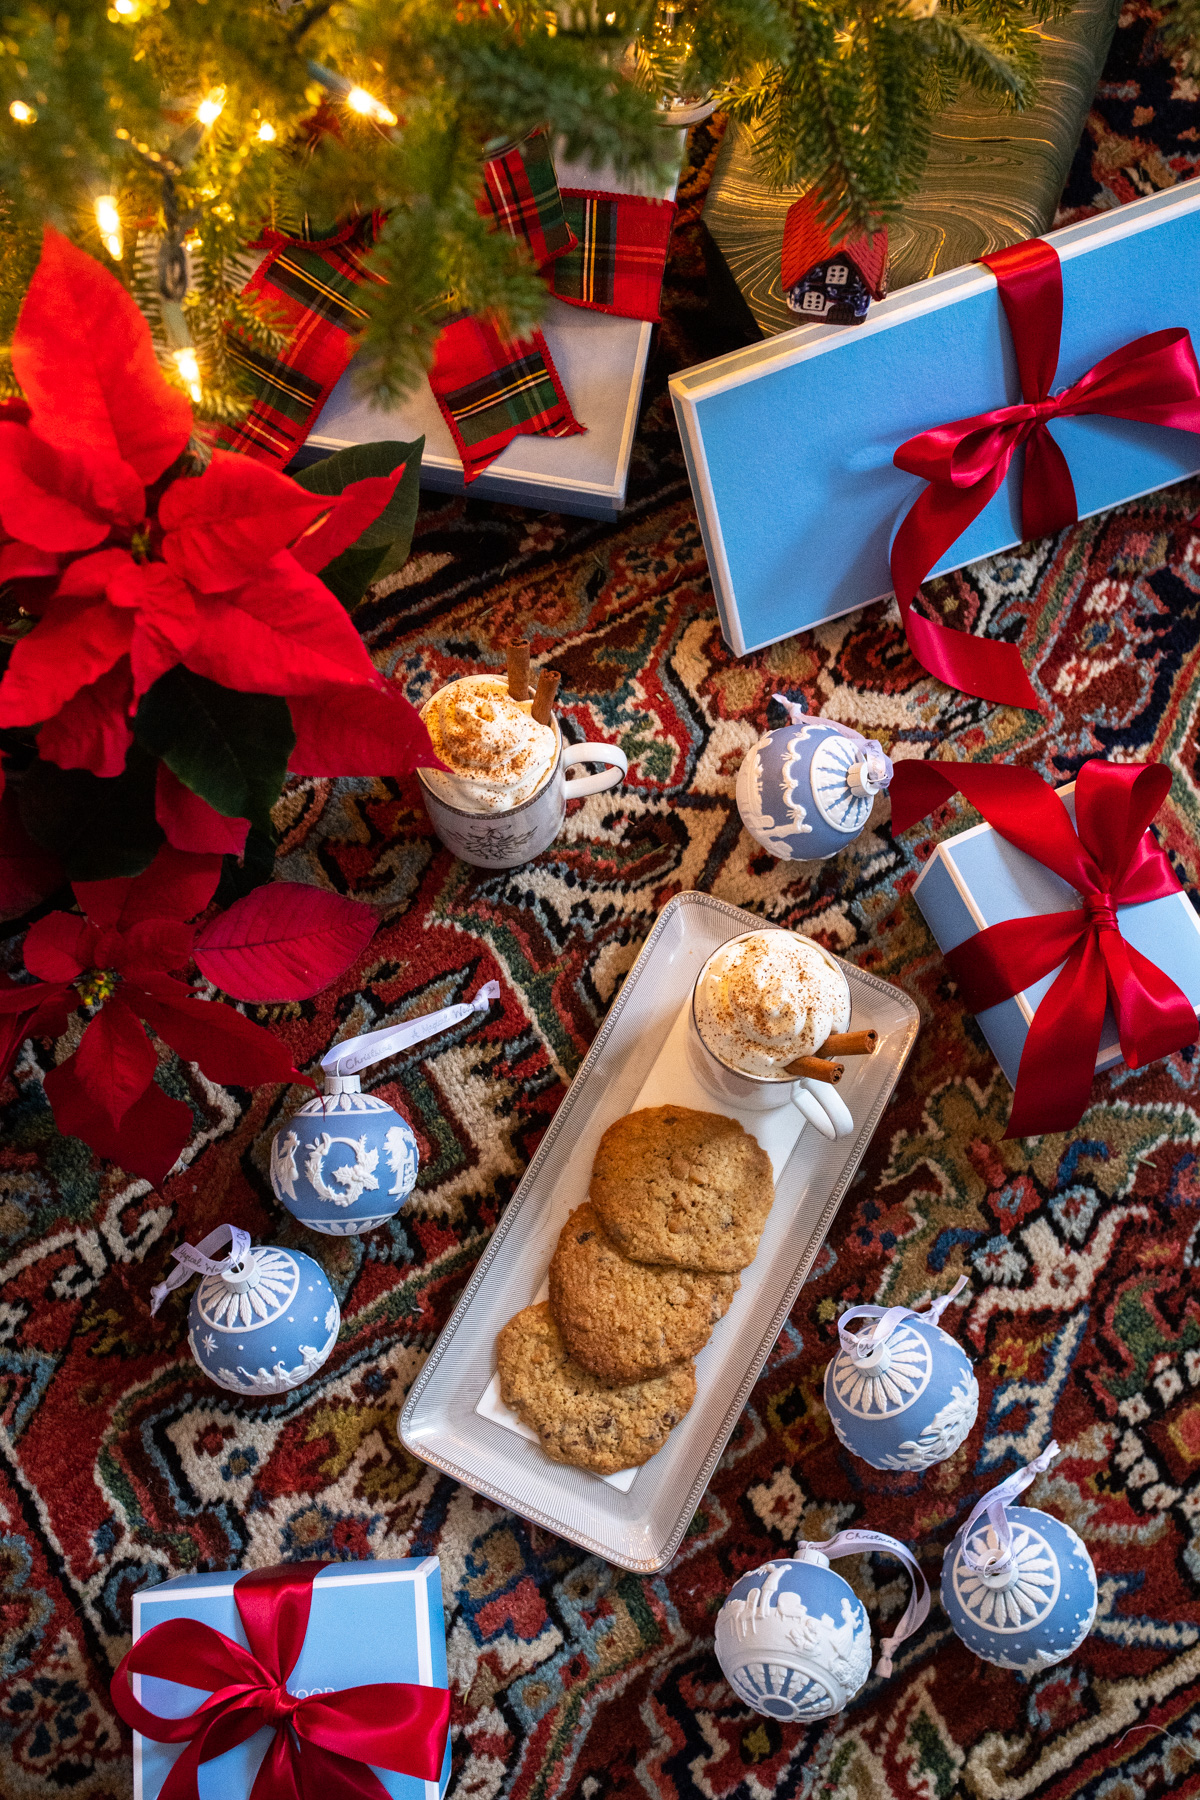 Stacie Flinner x New England Holiday Decorations-3.jpg